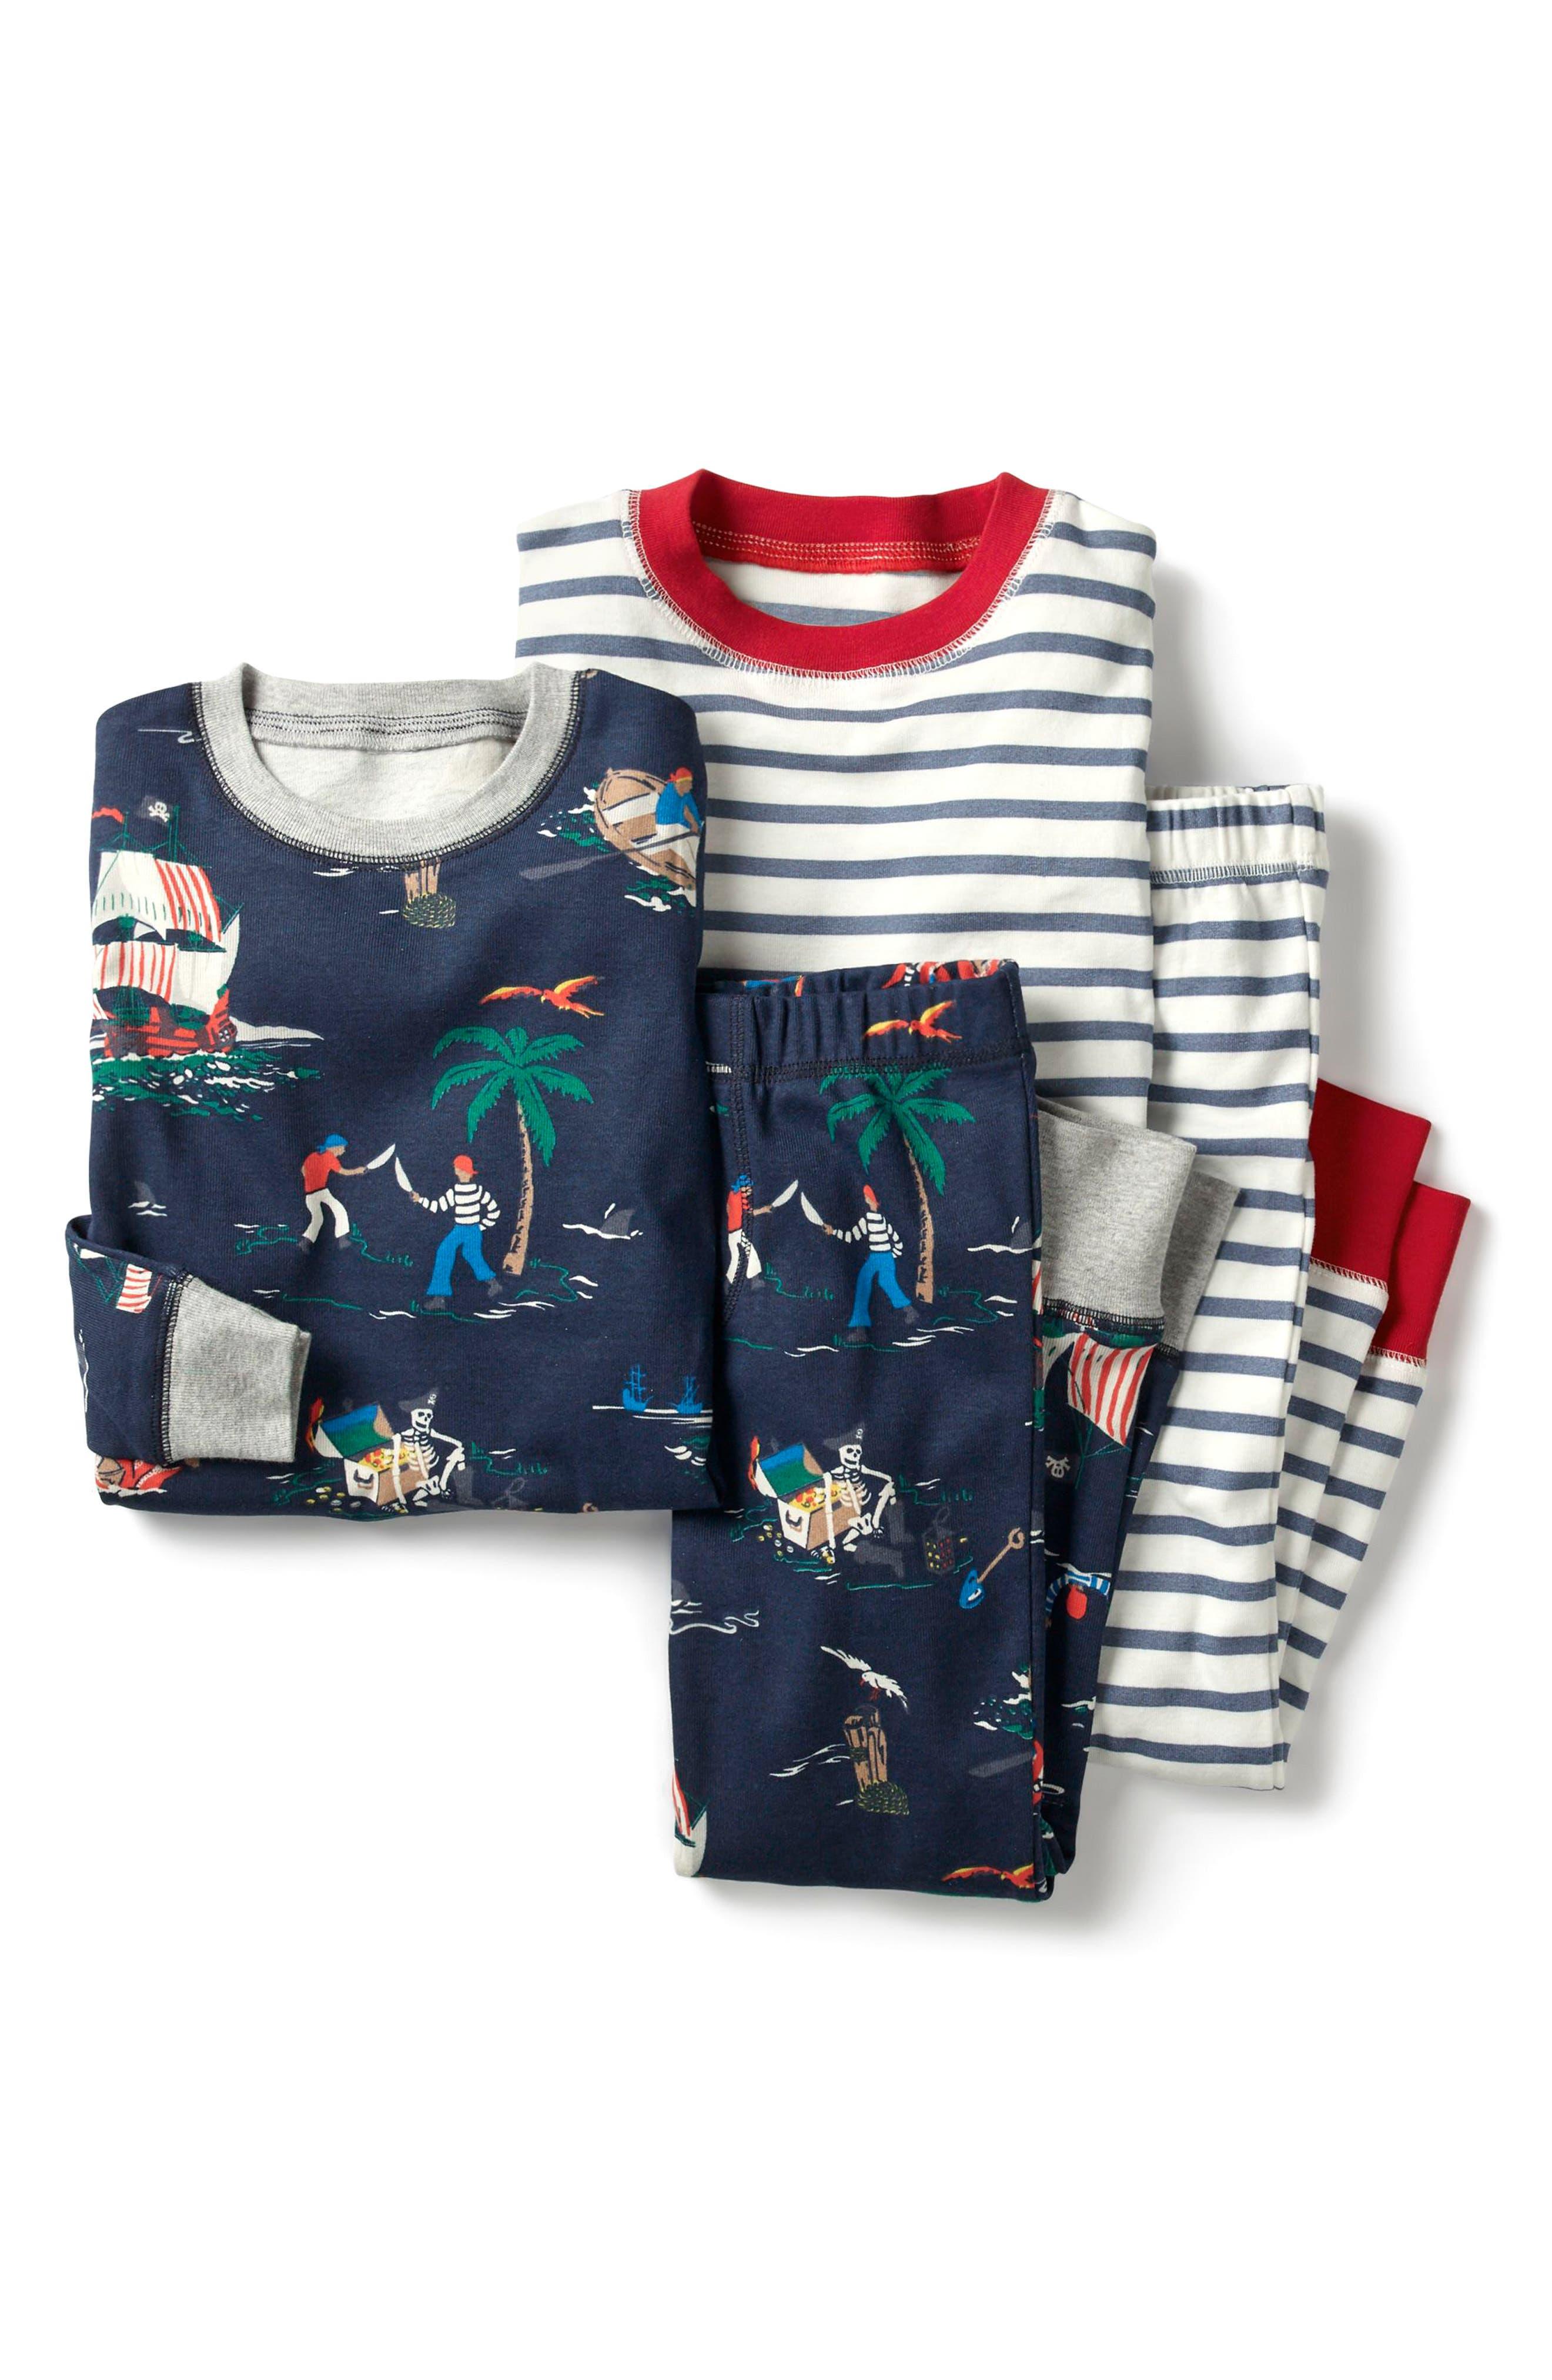 2-Pack Two-Piece Pajamas,                         Main,                         color, School Navy Pirates